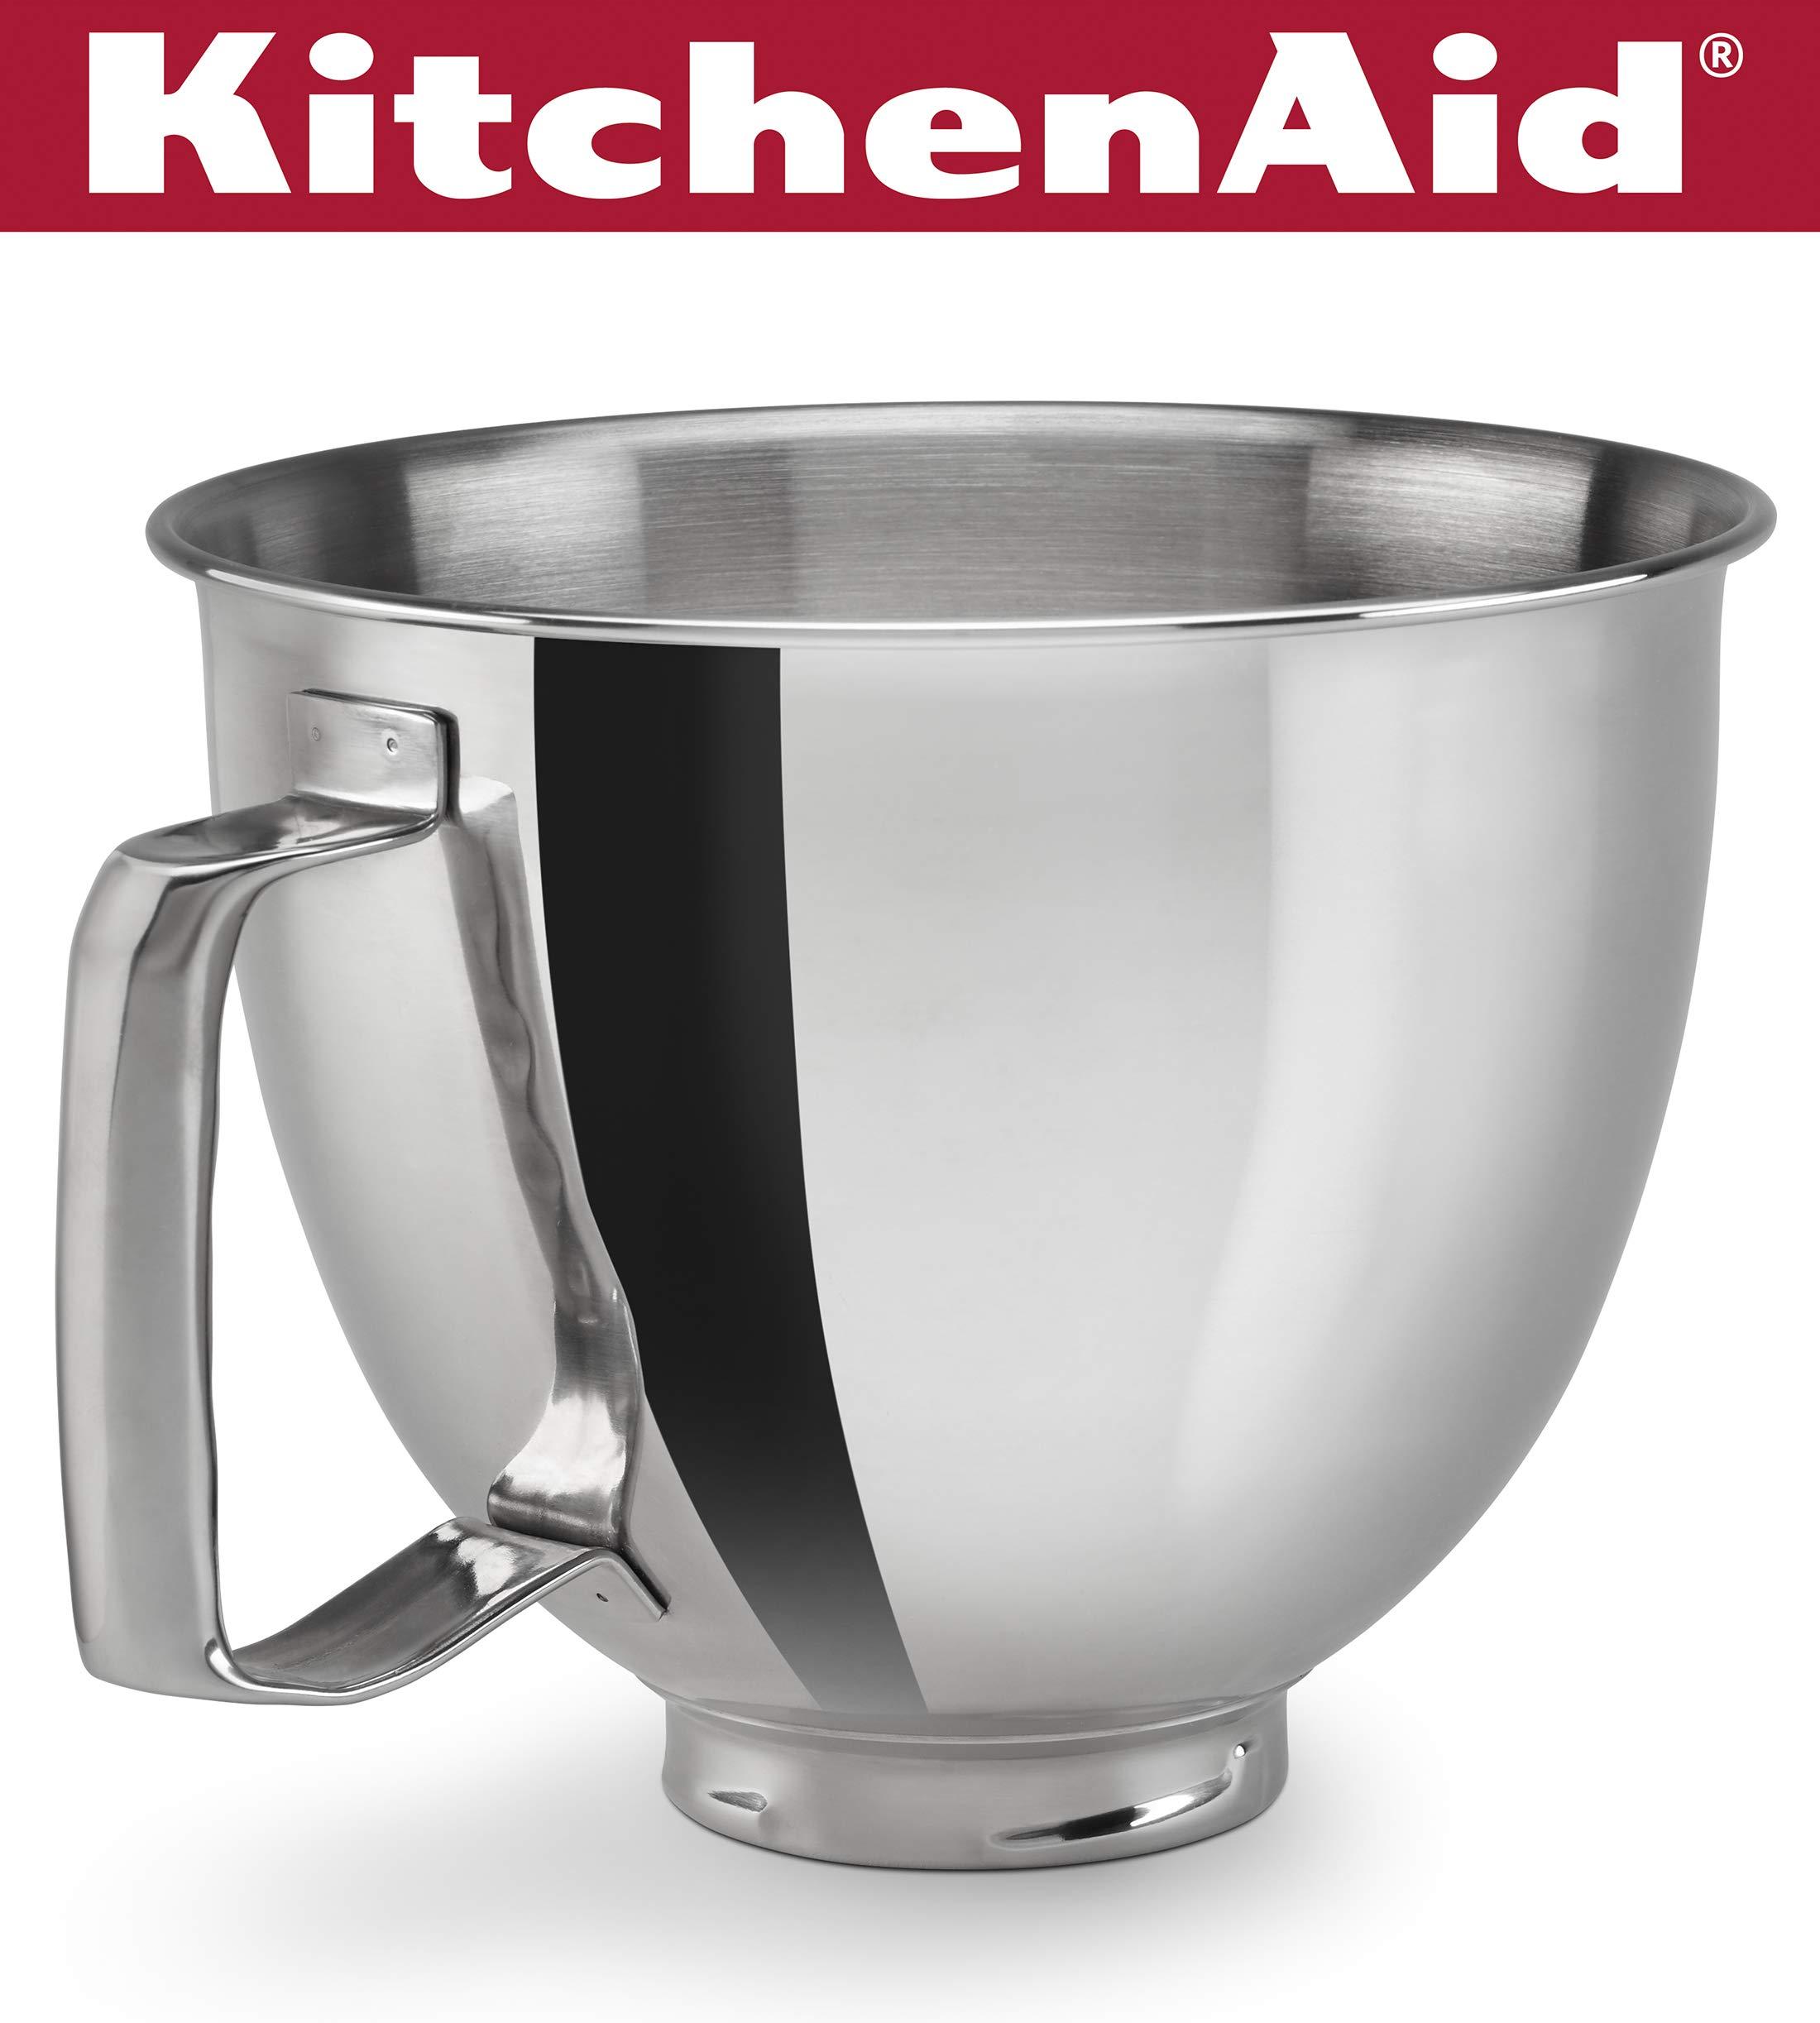 KitchenAid KSM35SSFP Polished Stainless Steel Bowl with Handle, Metallic by KitchenAid